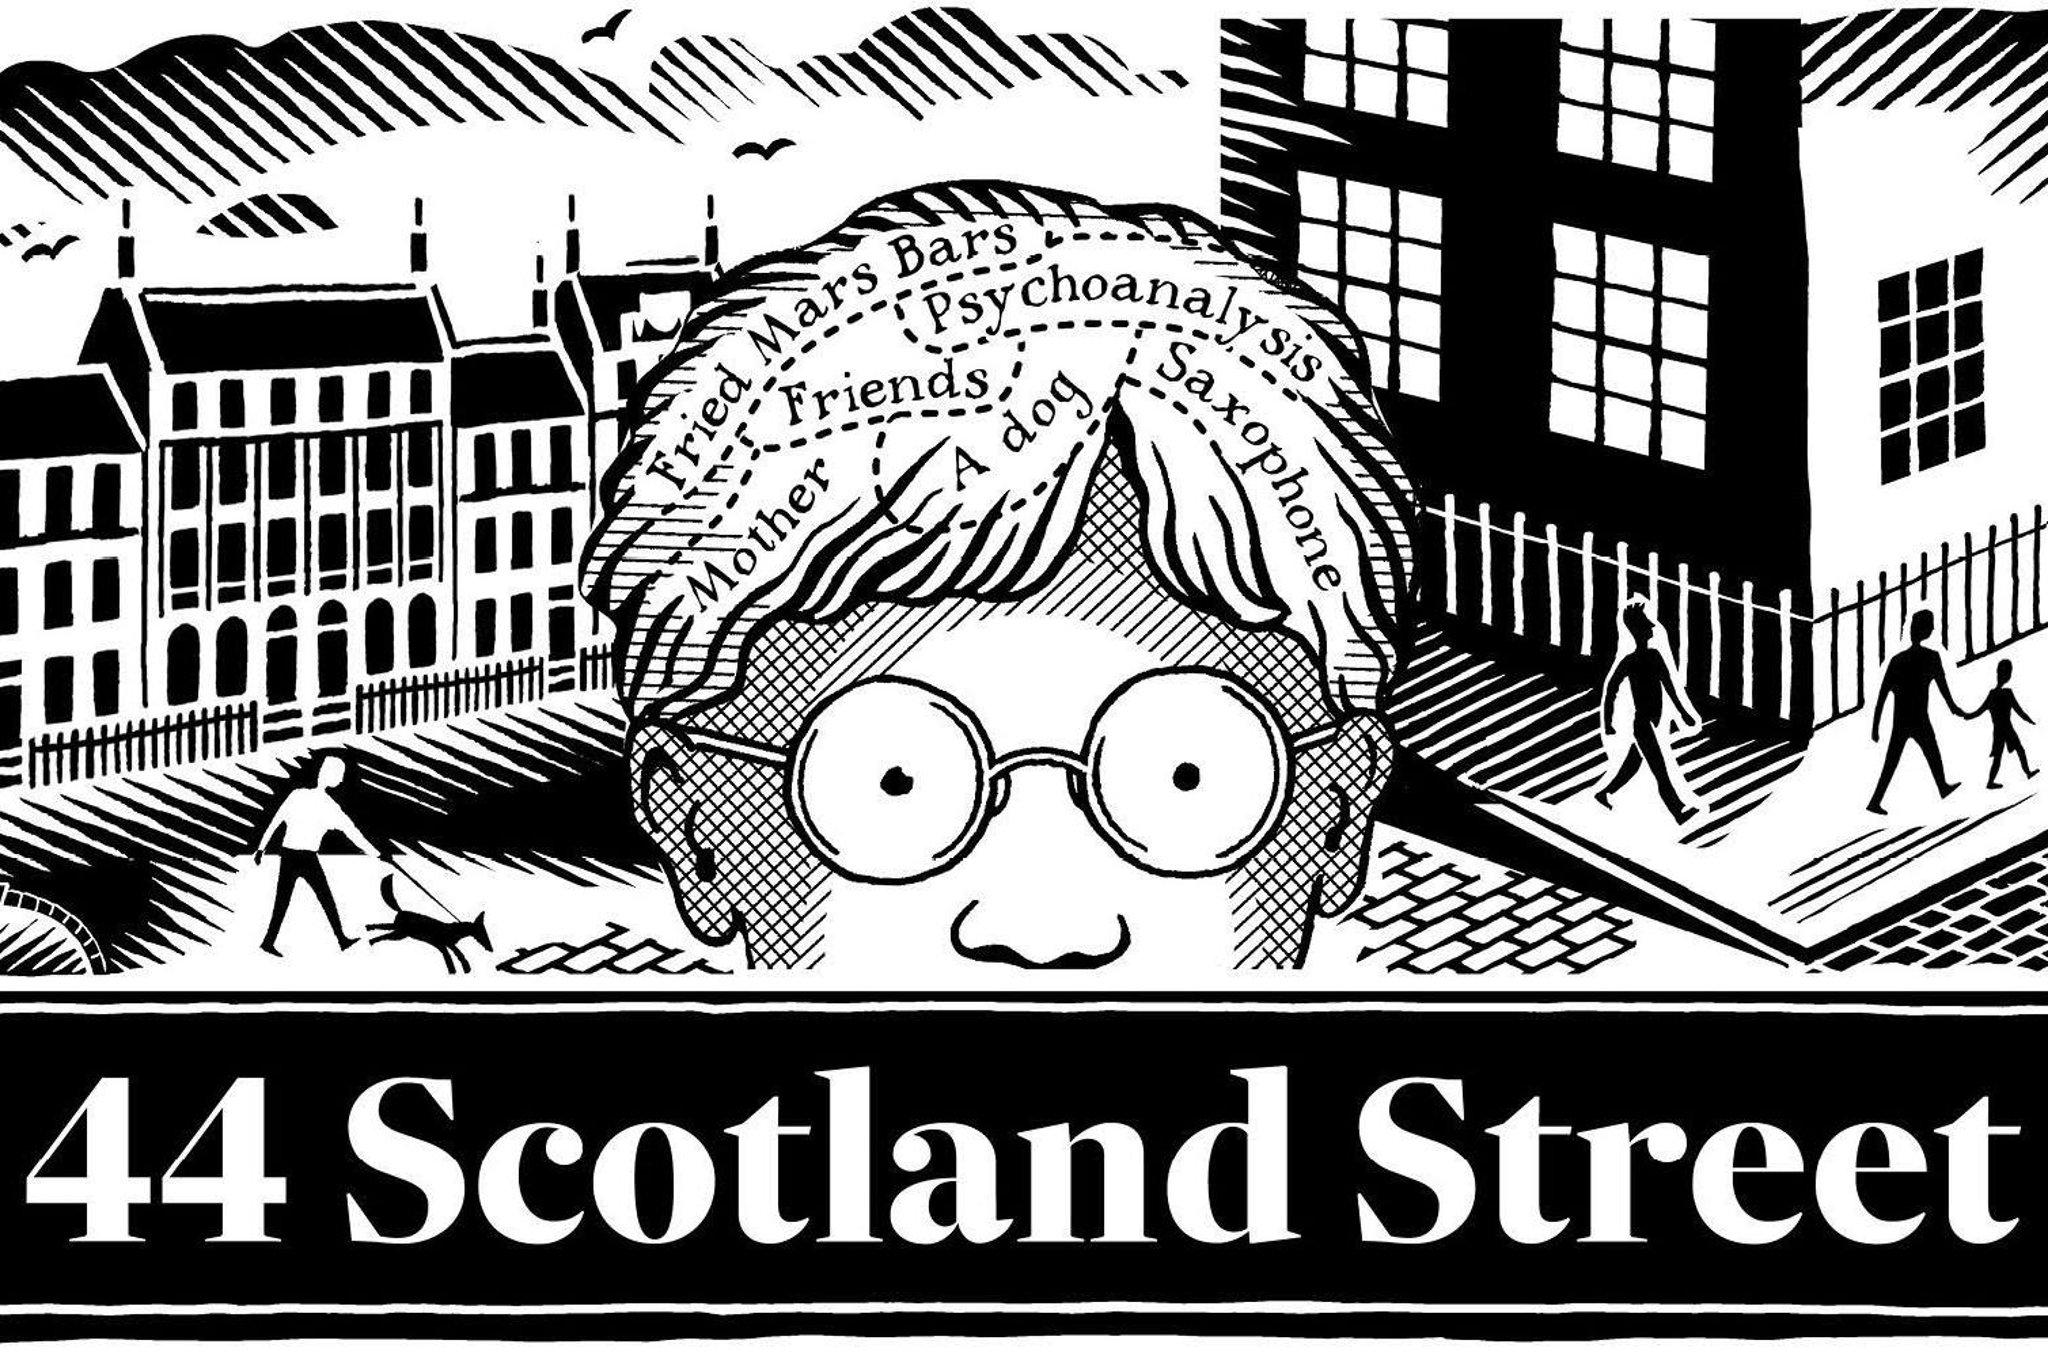 Scotland Street Volume 15, Bab 49: Martini direncanakan